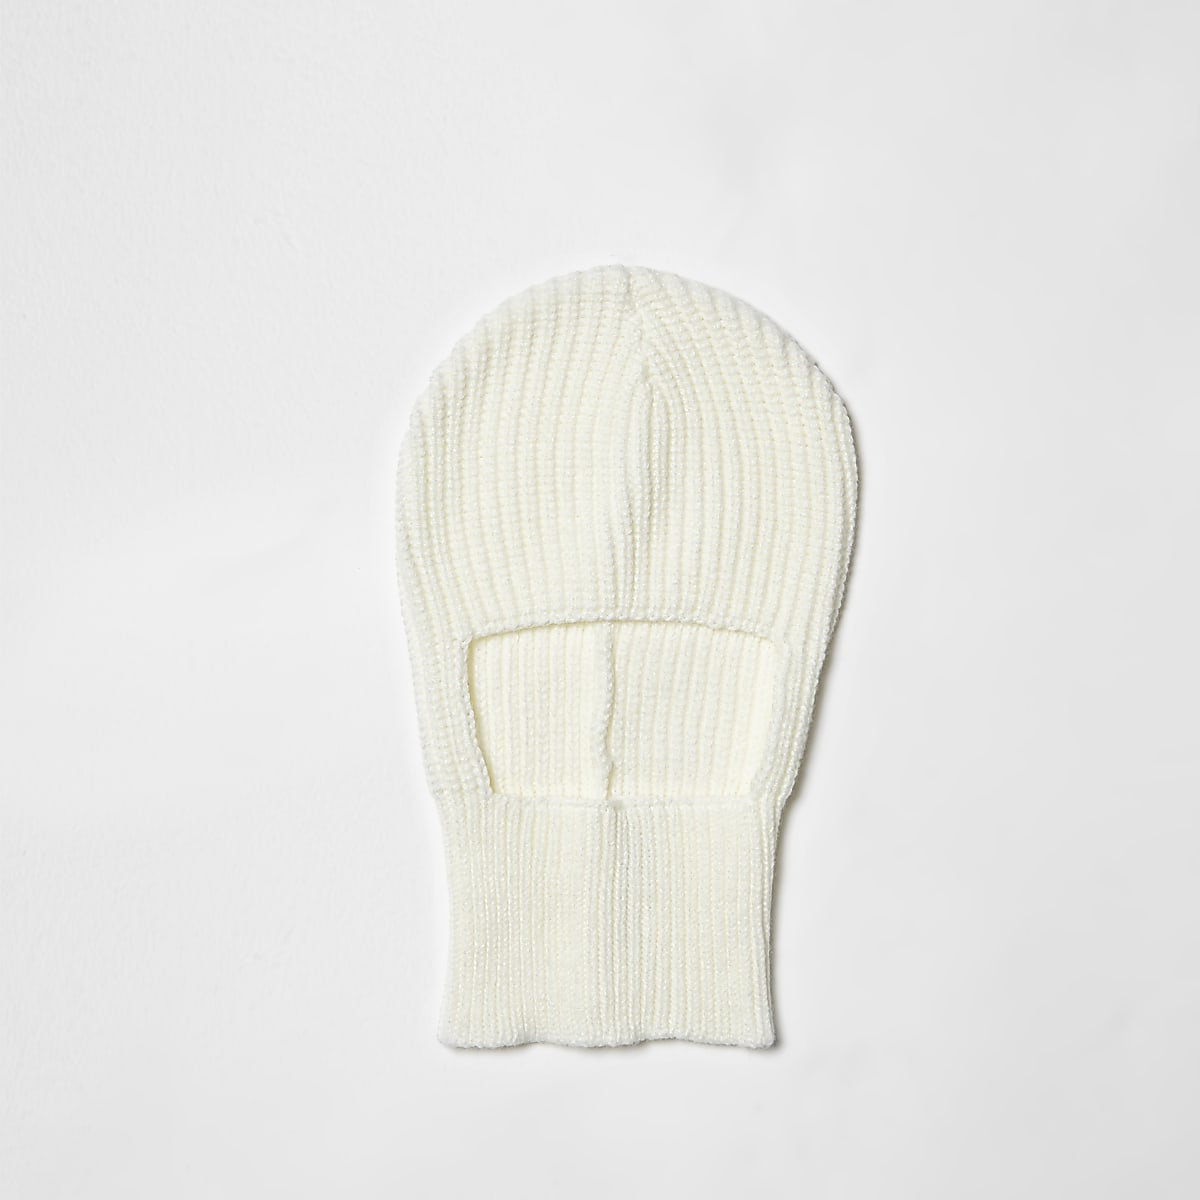 Cream rib knit balaclava